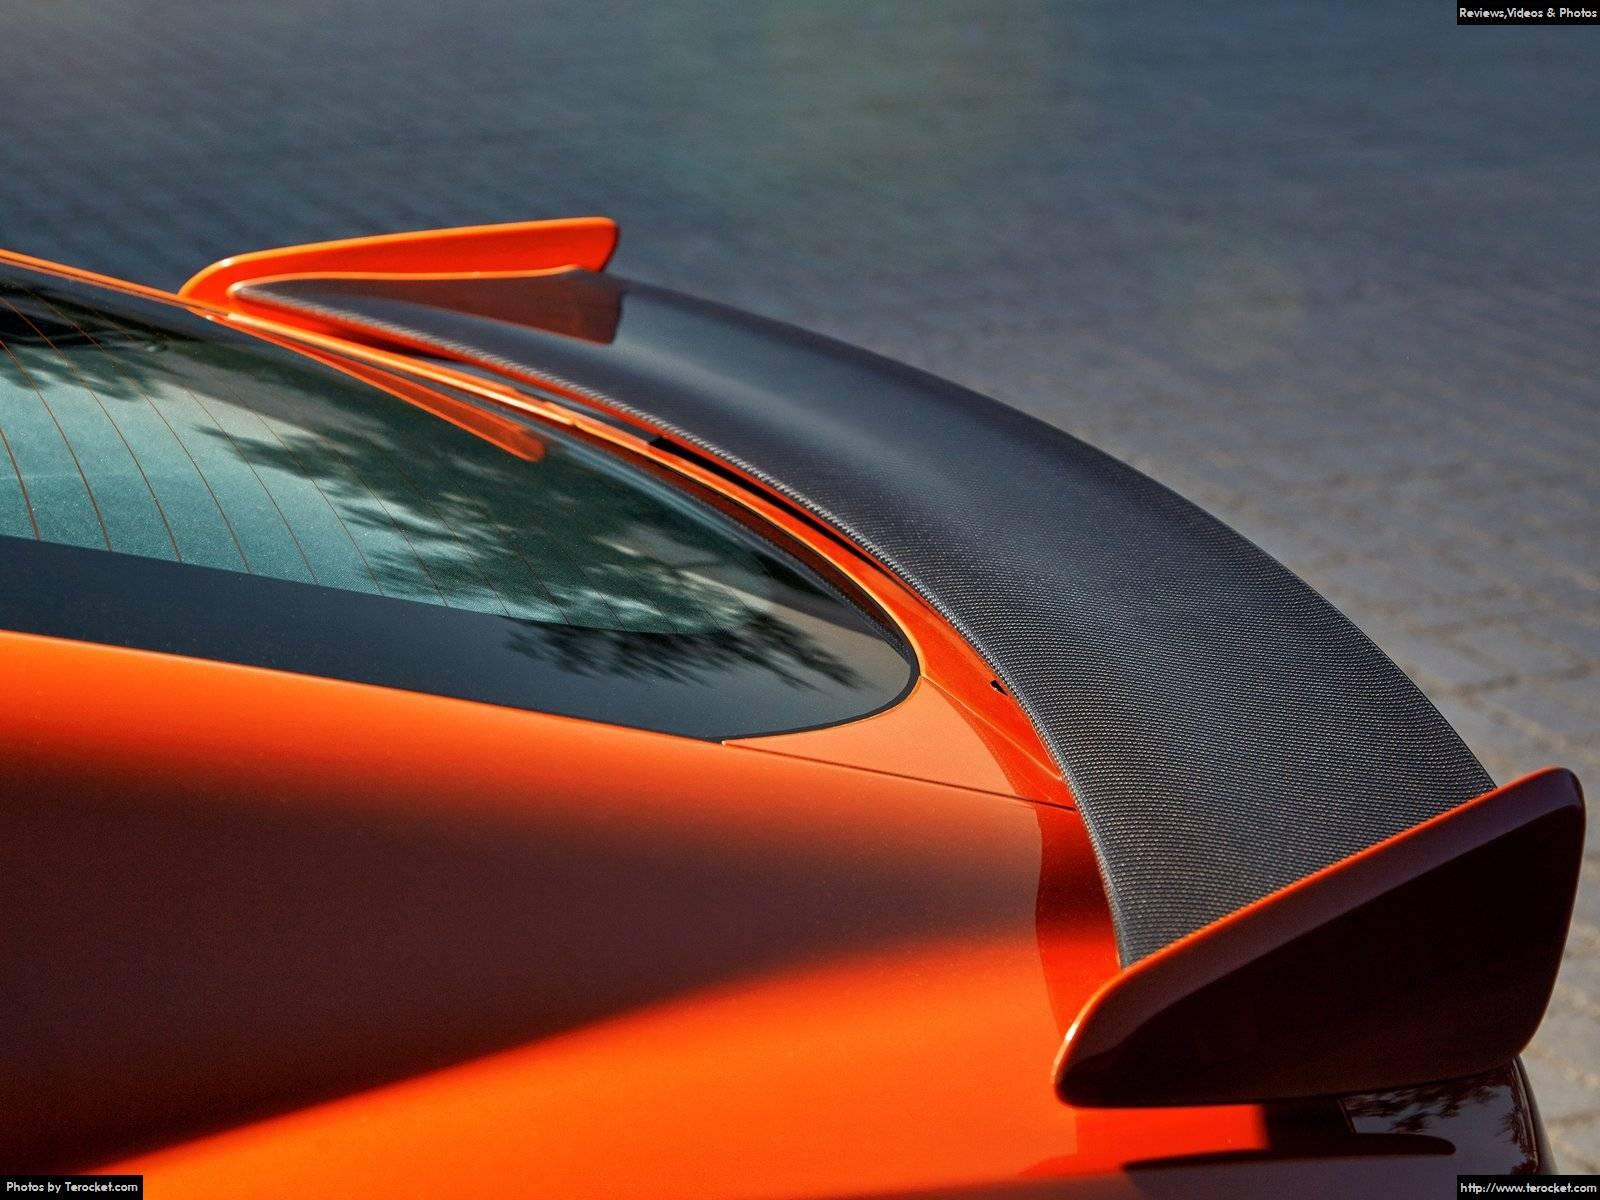 Hình ảnh xe ô tô Jaguar F-Type SVR Coupe 2017 & nội ngoại thất